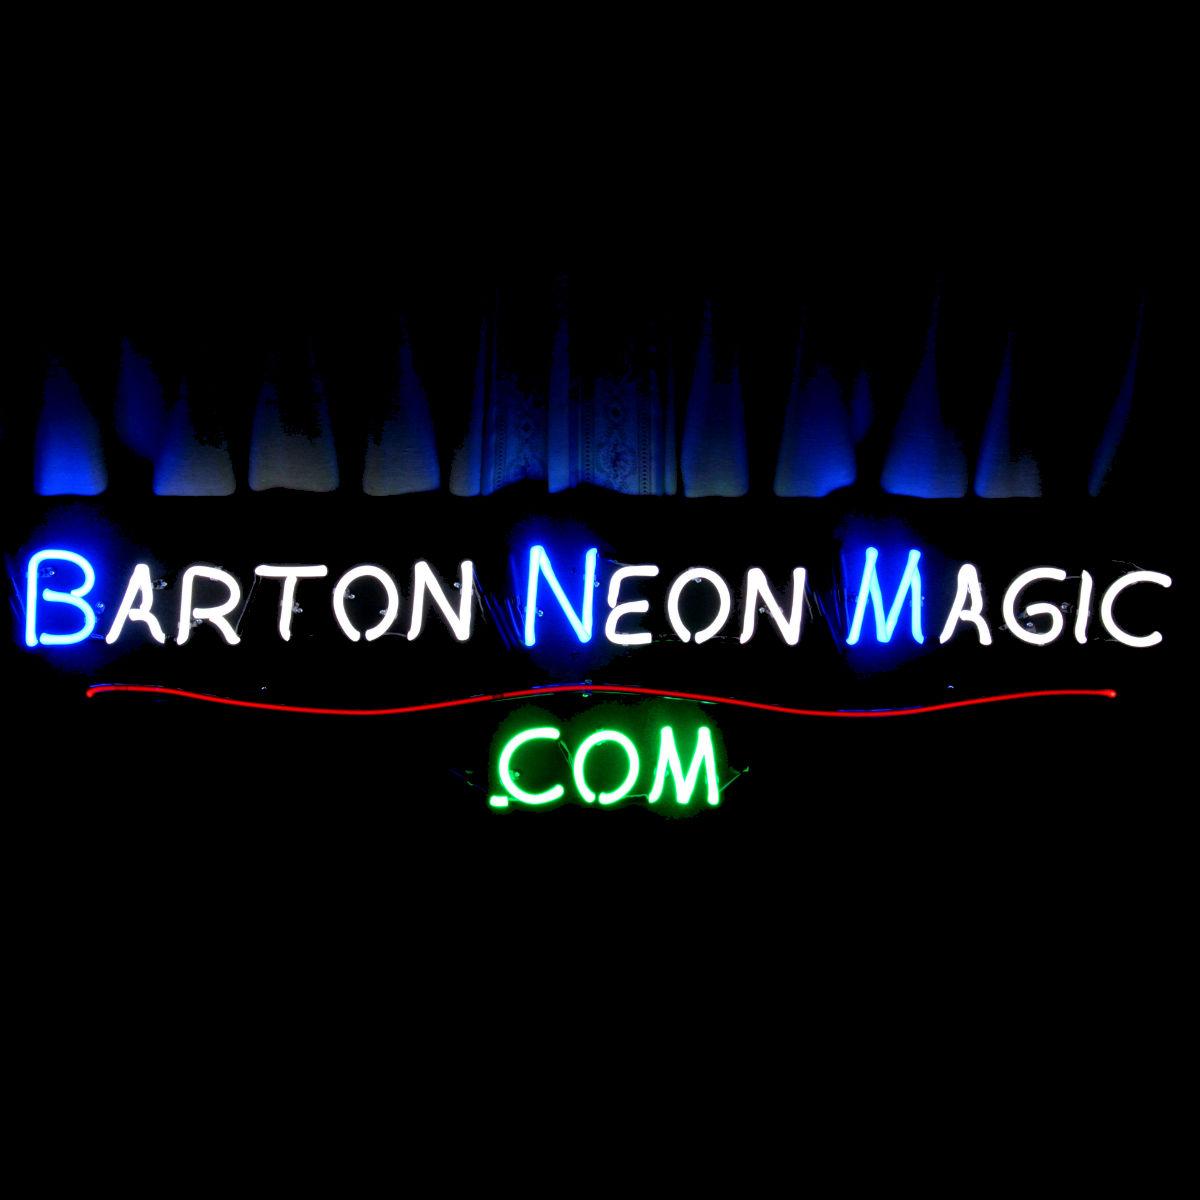 Scottie Dog Neon Light Sculpture by John Barton - famous USA Neon Glass Artist - BartonNeonMagic.com